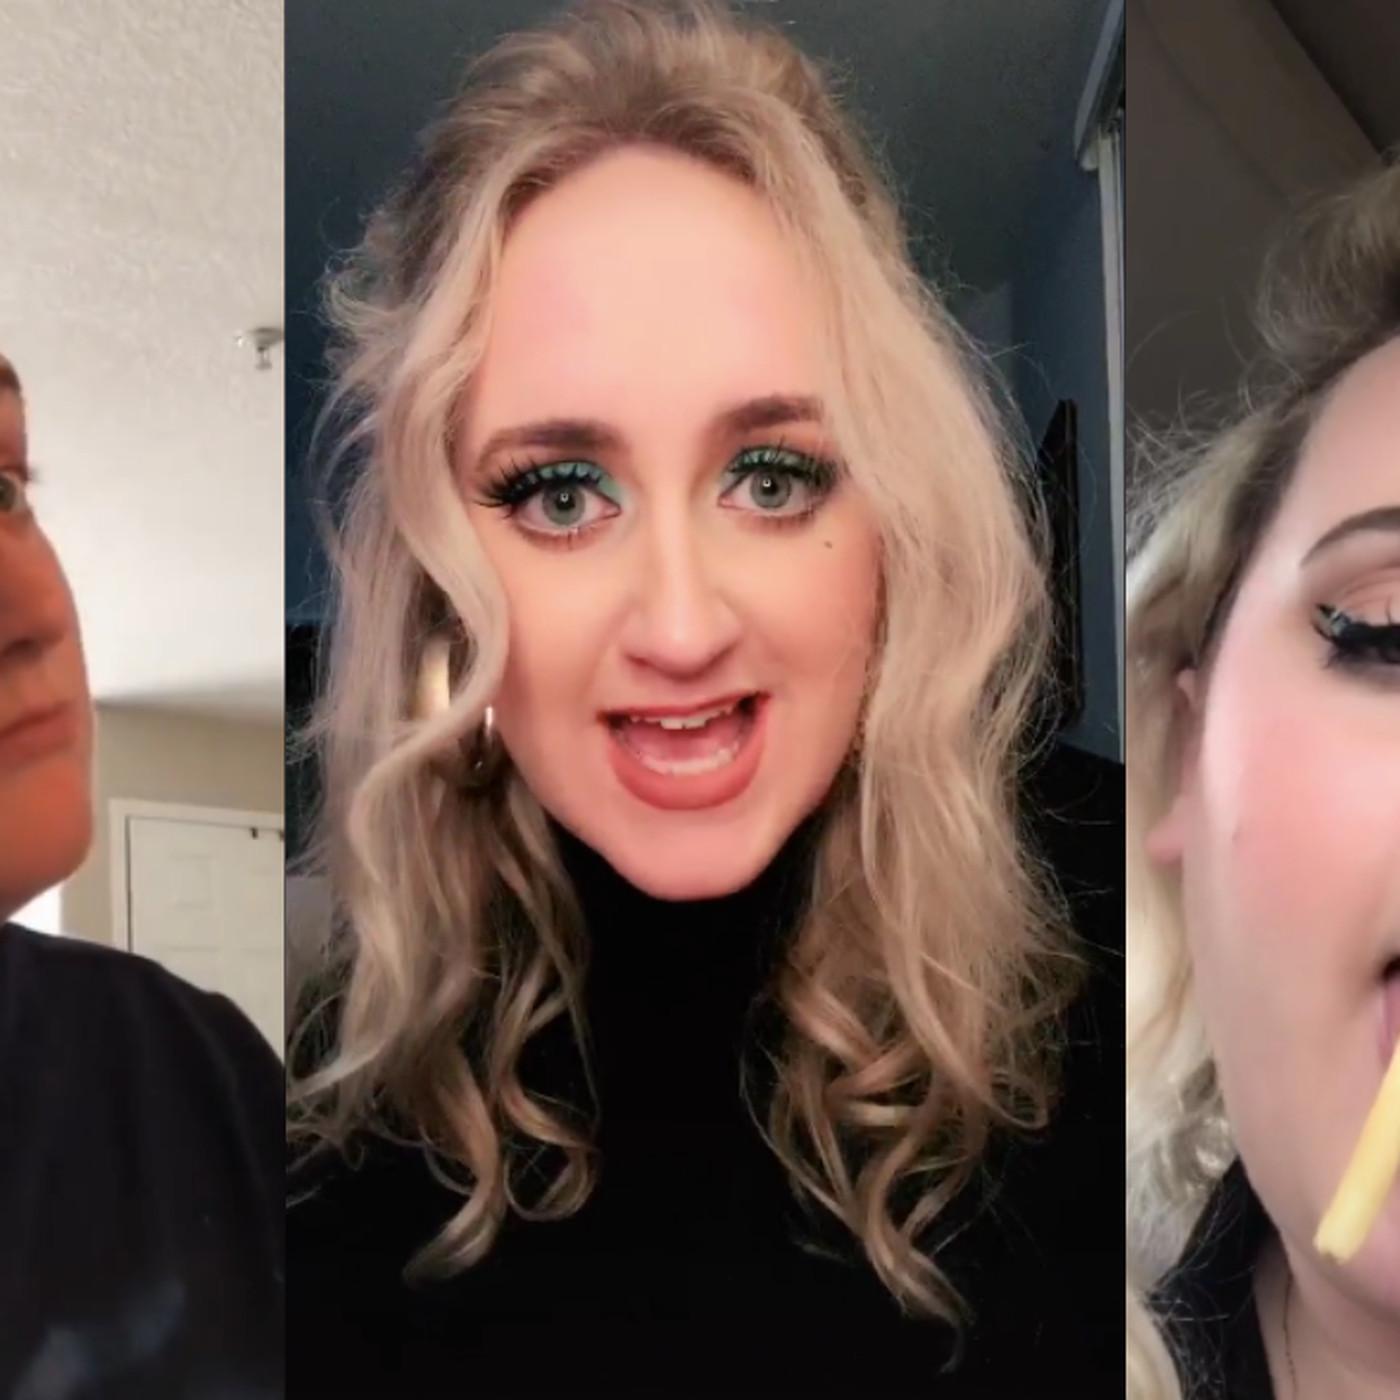 A 💄 shit pretty girl taking Pretty Girls